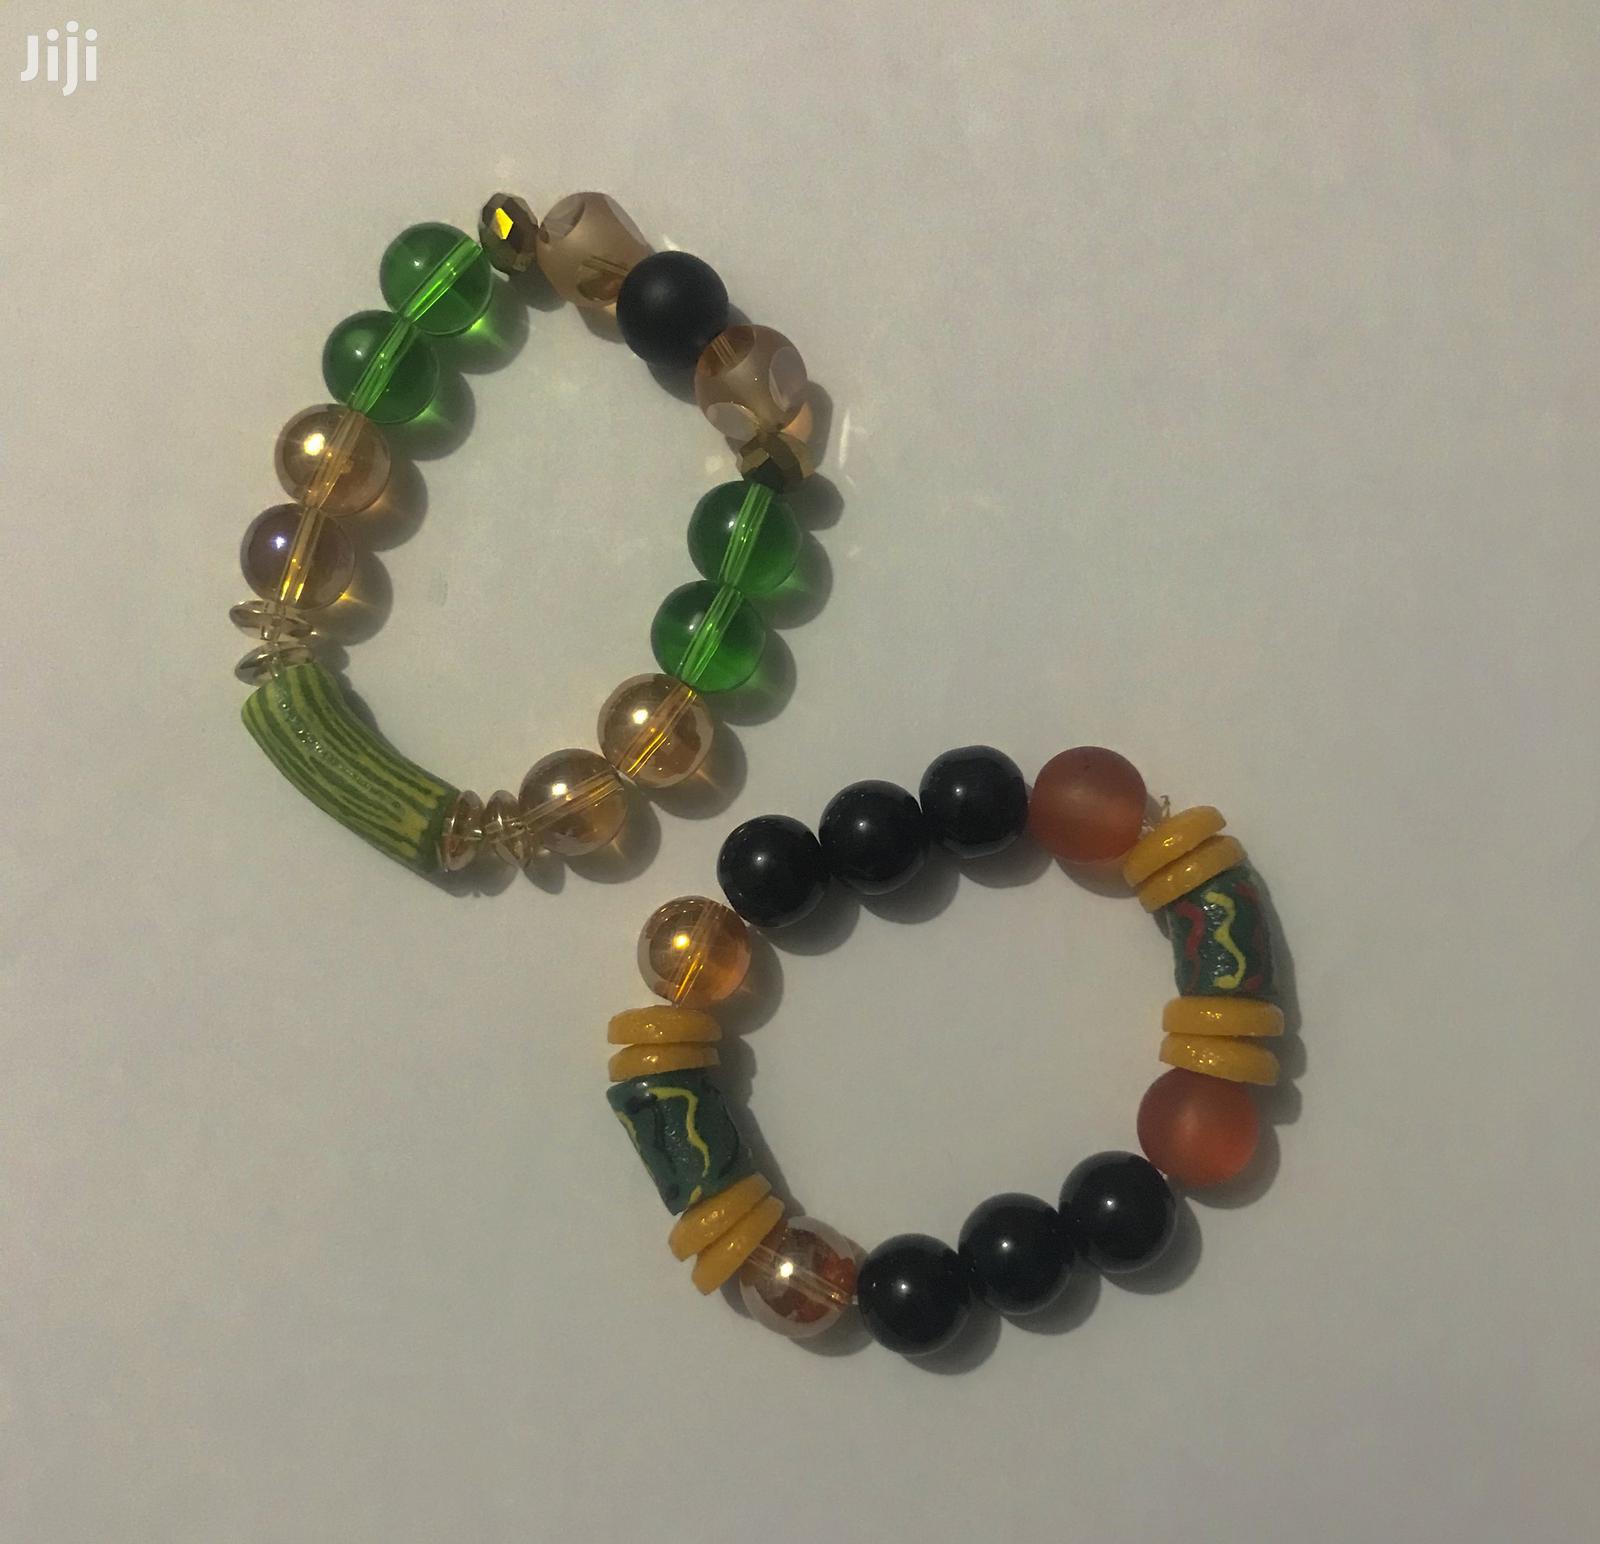 Beads Bracelet   Jewelry for sale in Kumasi Metropolitan, Ashanti, Ghana